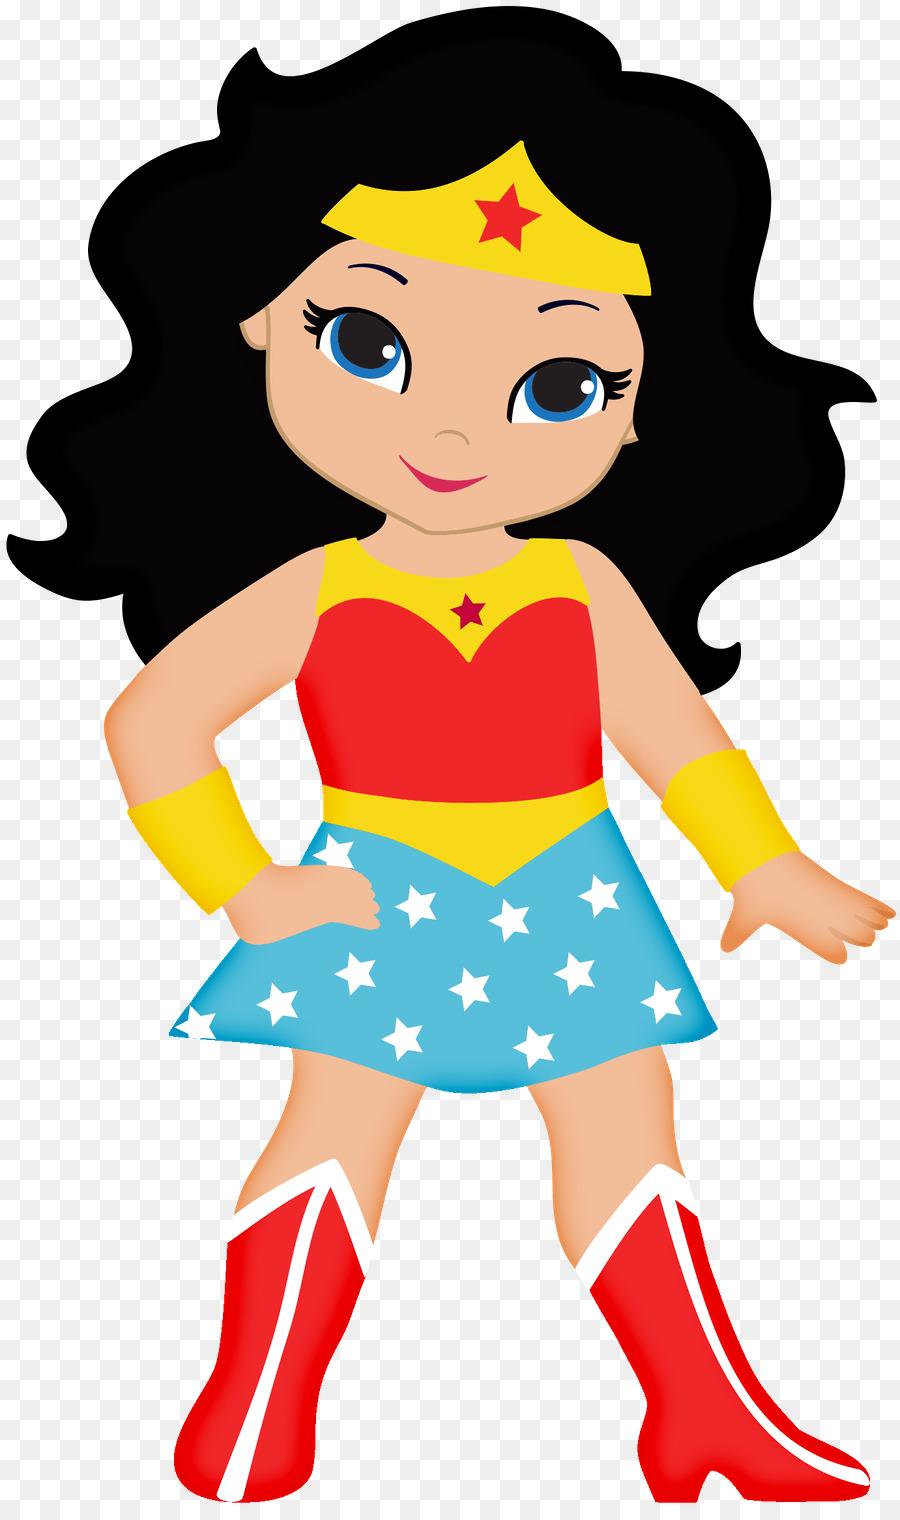 900x1520 Projects Idea Superwoman Clip Art Cartoon Vector Superman Female